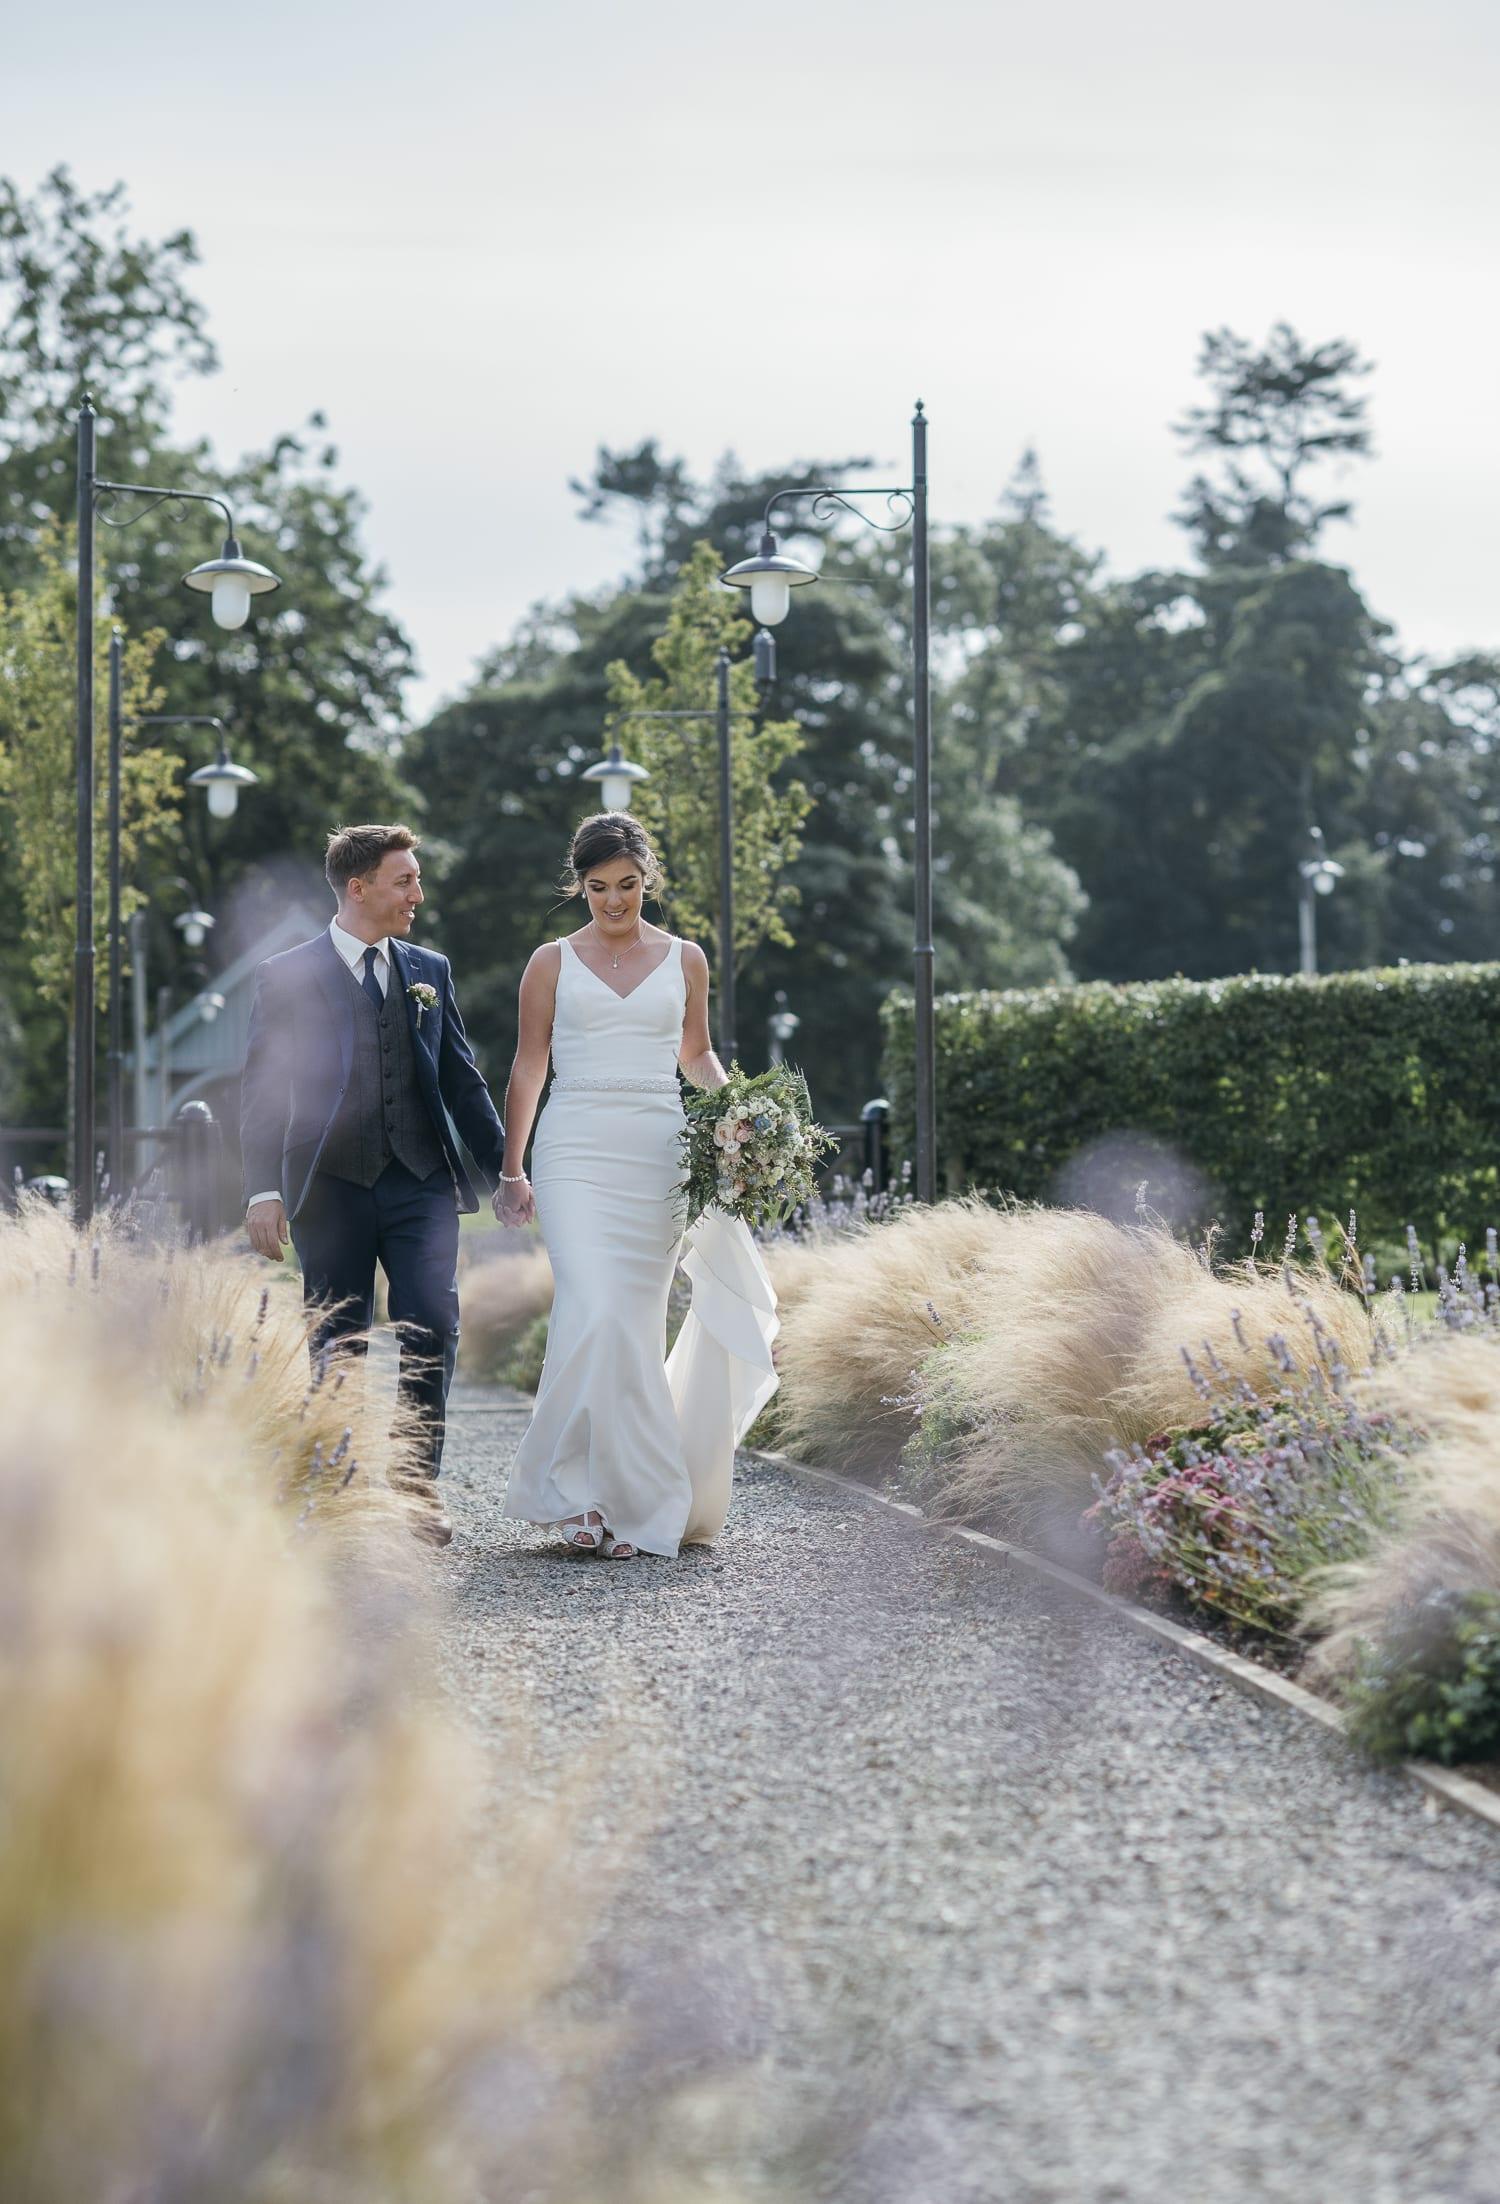 Montalto wedding photography